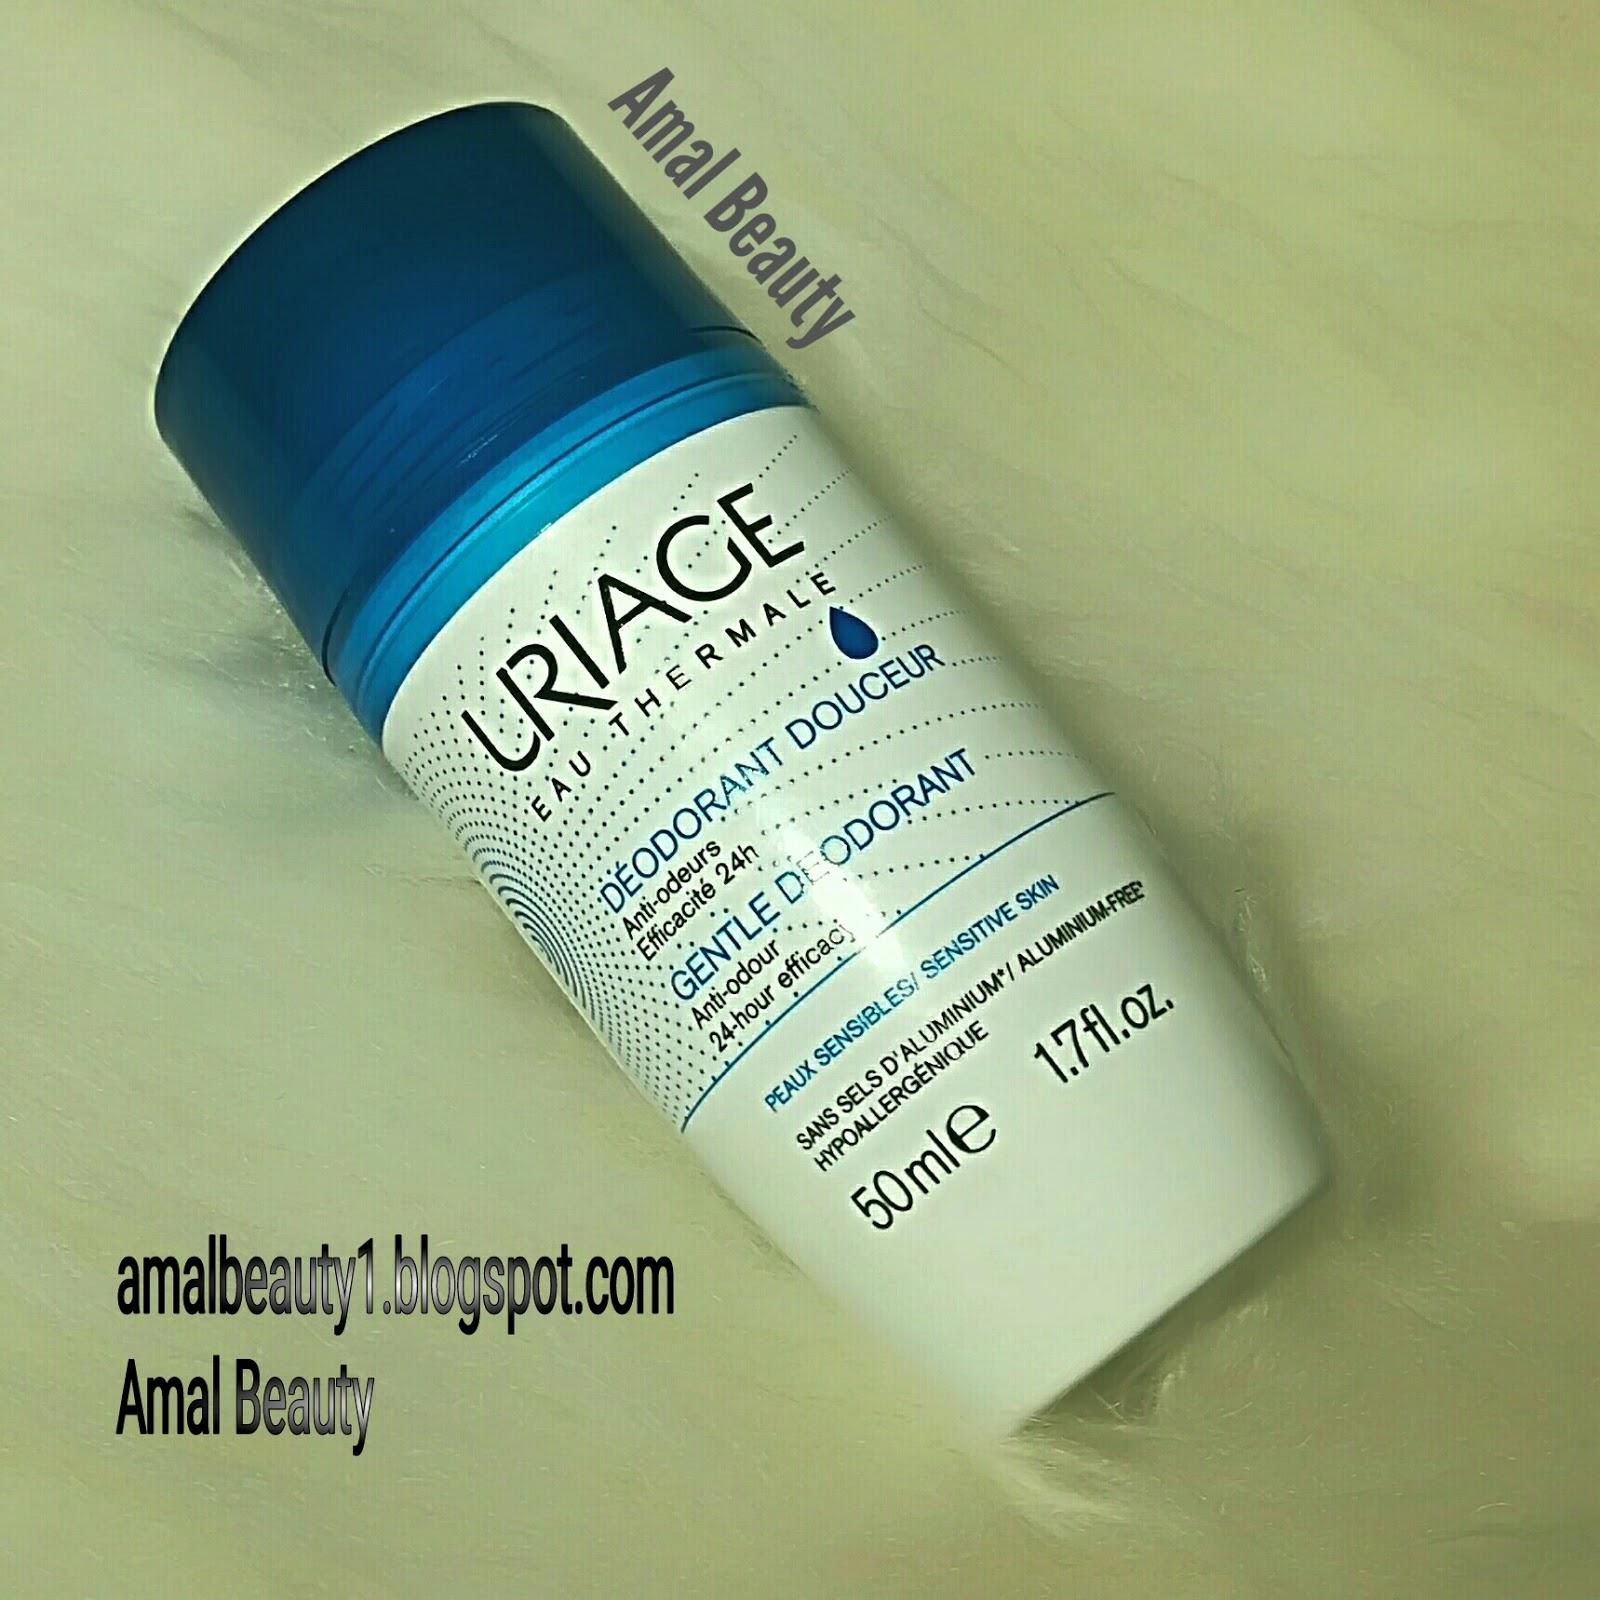 19e64f4e8 Amal Beauty : افضل مزيل رائحة عرق طبي